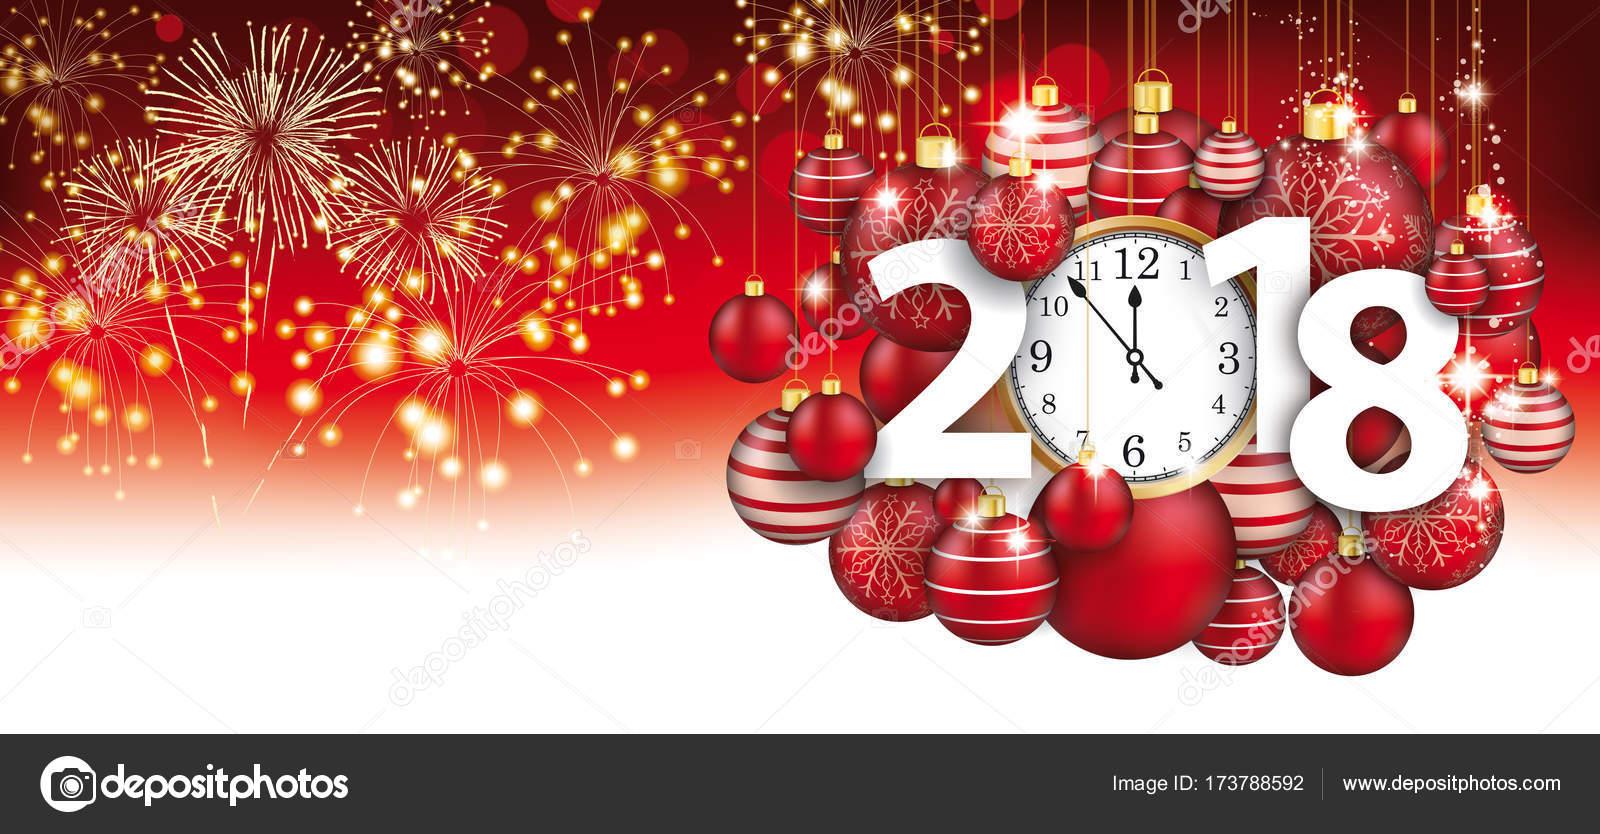 kerst 2018 datum Kerst Datum 2018   ARCHIDEV kerst 2018 datum